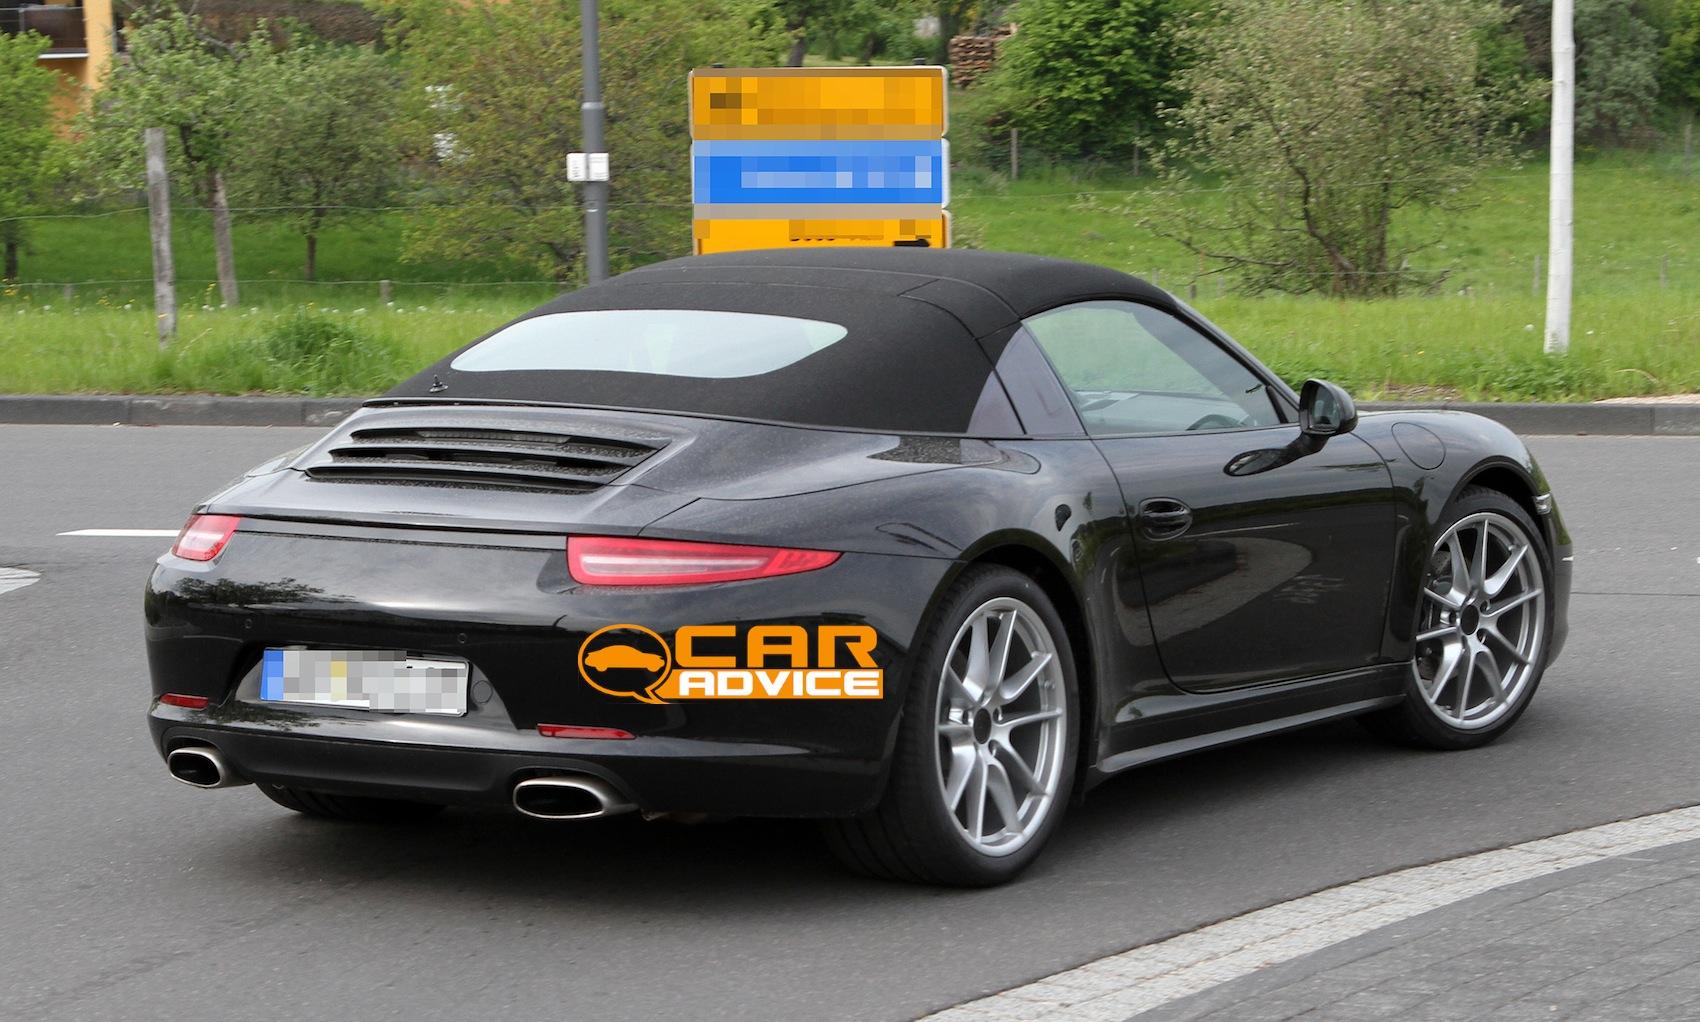 Porsche 911 Targa Iconic Roof Design Returns Photos